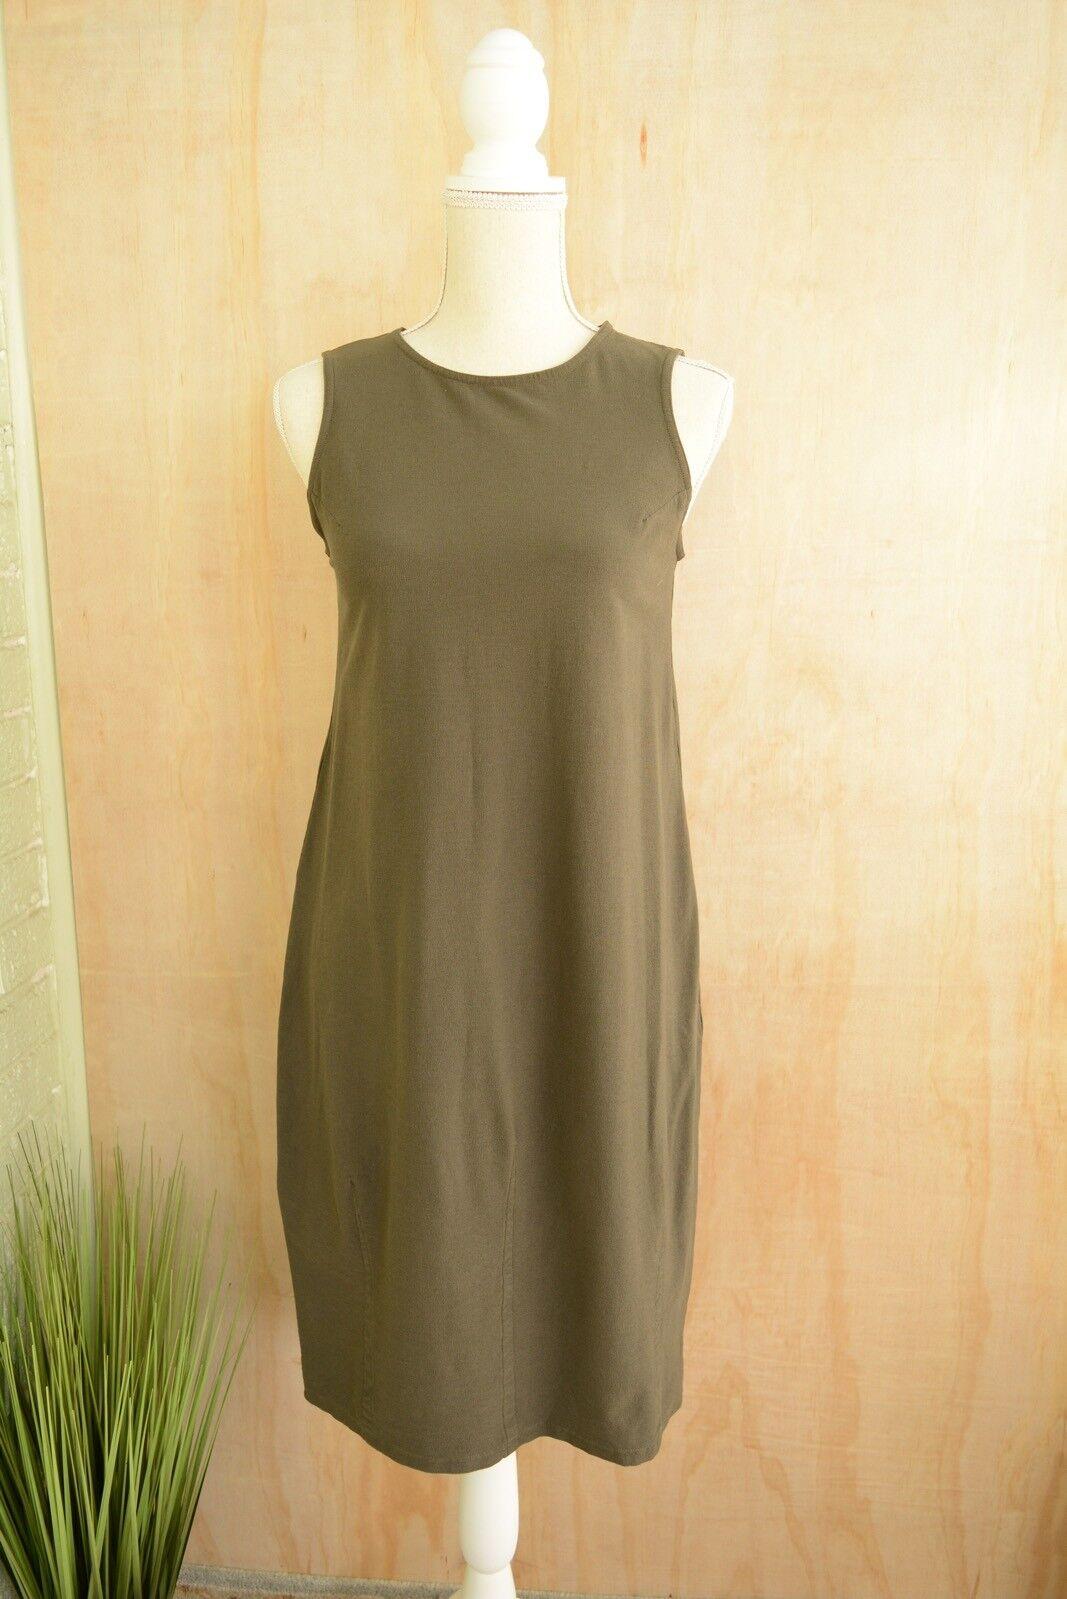 Eileen Fisher - Dark khaki green sleeveless stretch tank dress, size P Petite